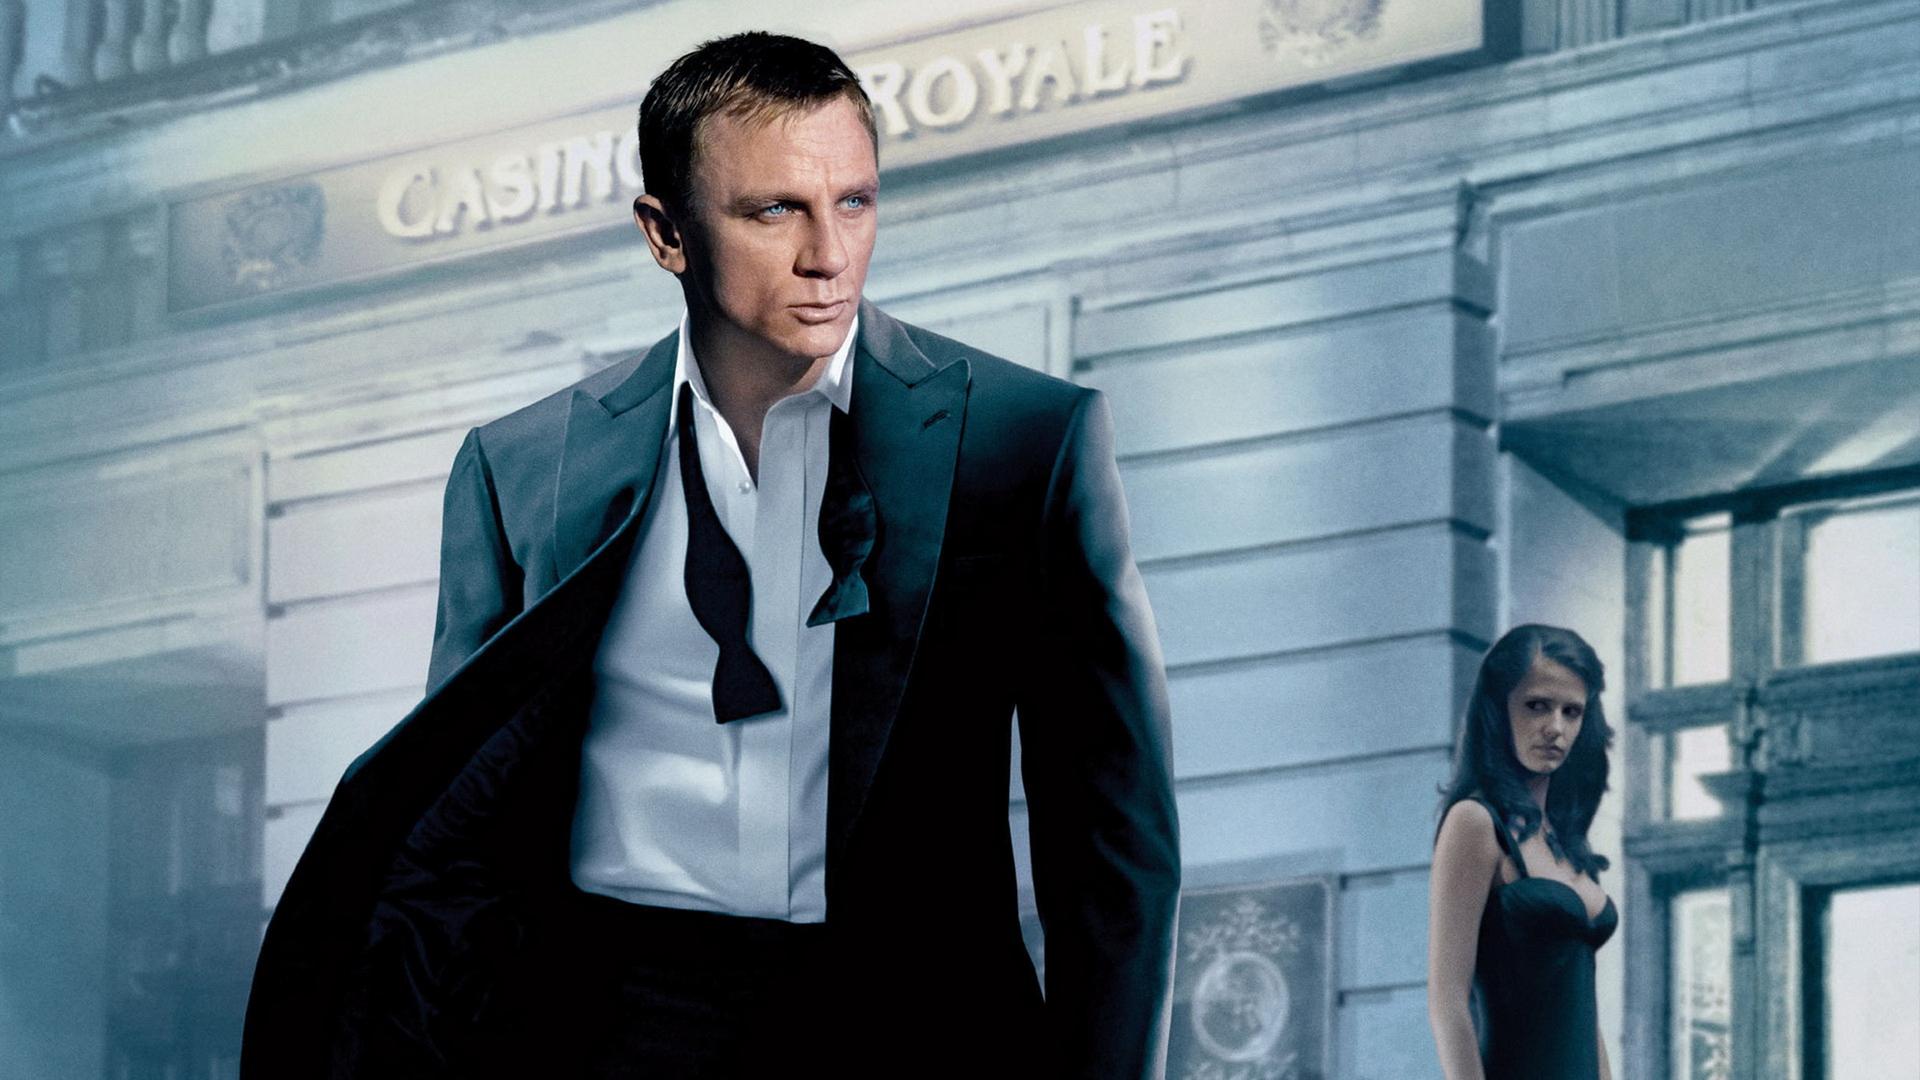 James Bond Wallpaper Hd 1080p 1 HD Desktop Wallpapers 1920x1080